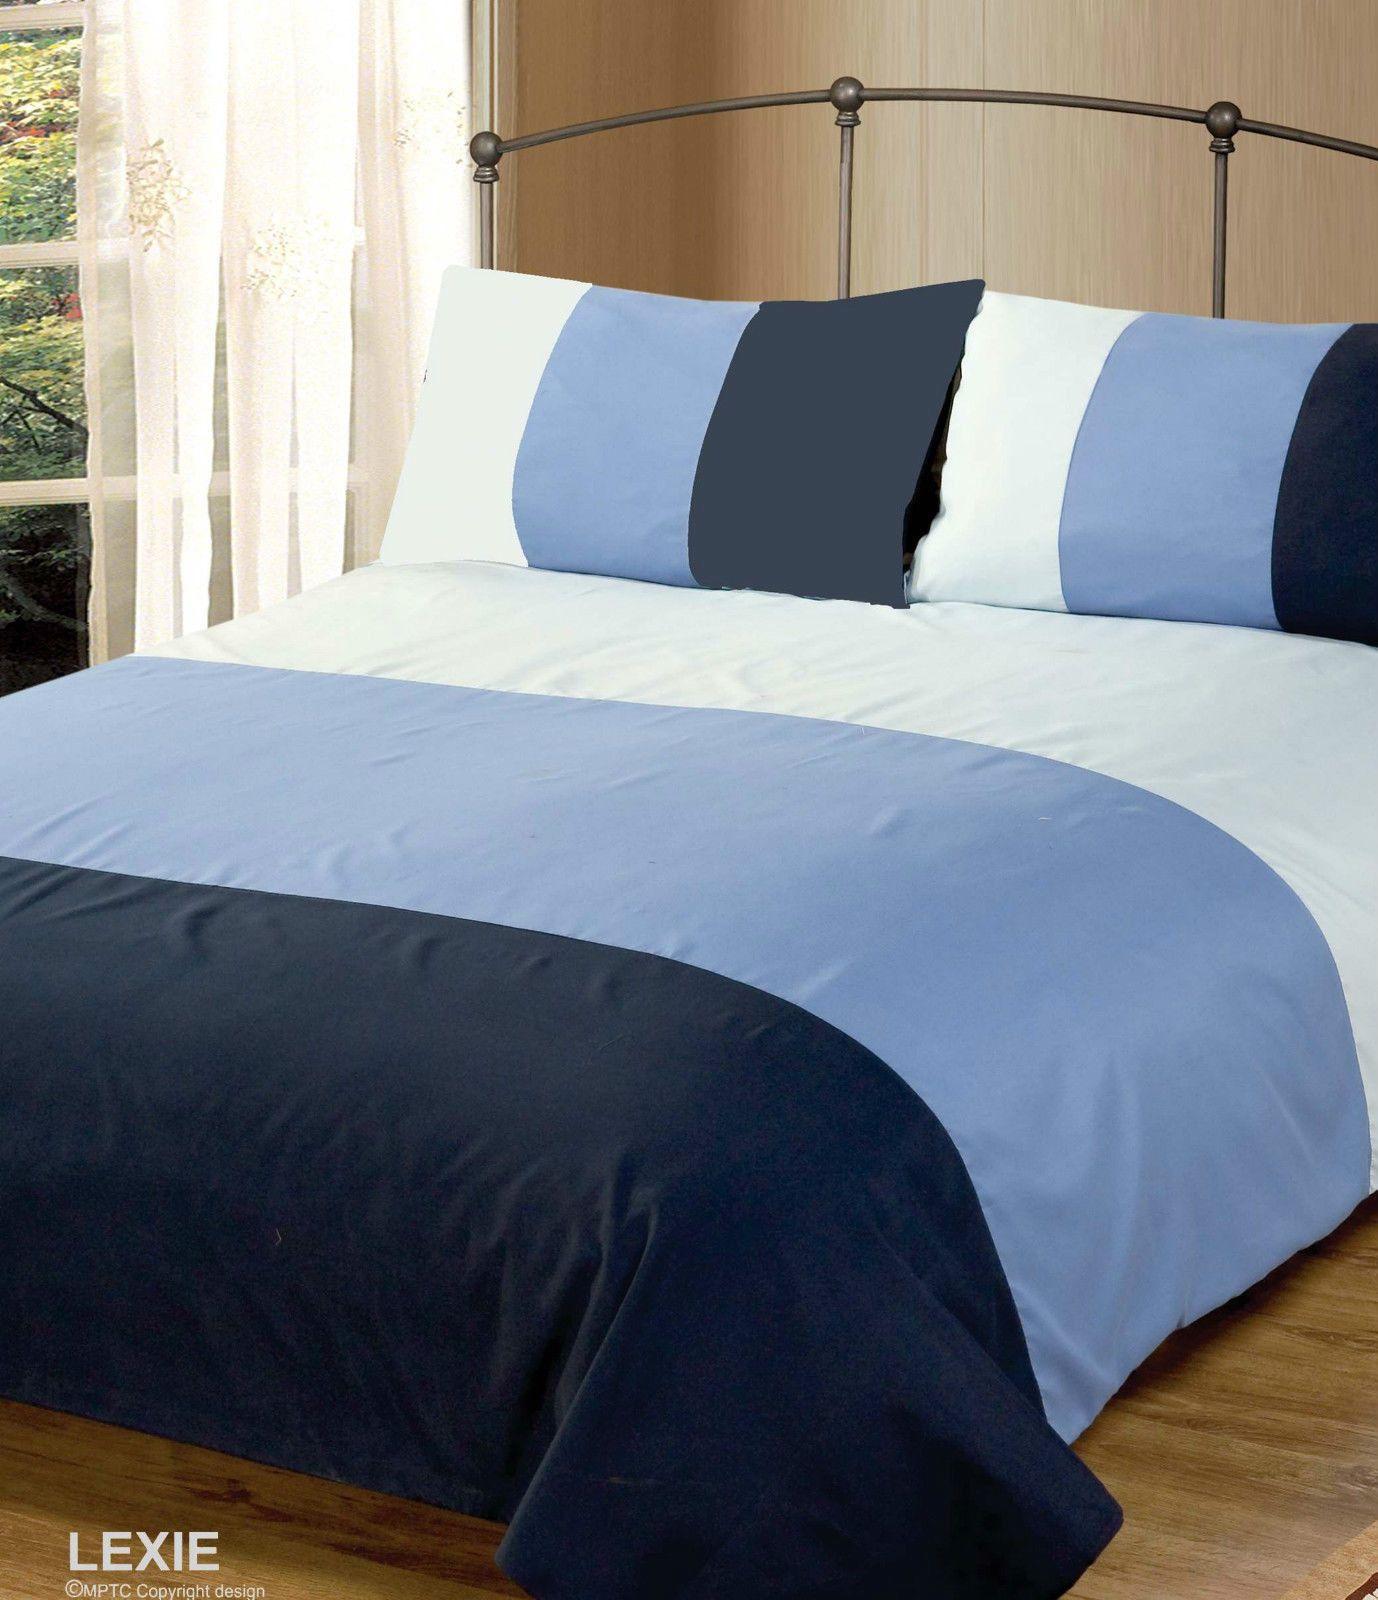 From Double Bed Duvet Quilt Cover Bedding Set Lexie Blue Plain 3 Tone